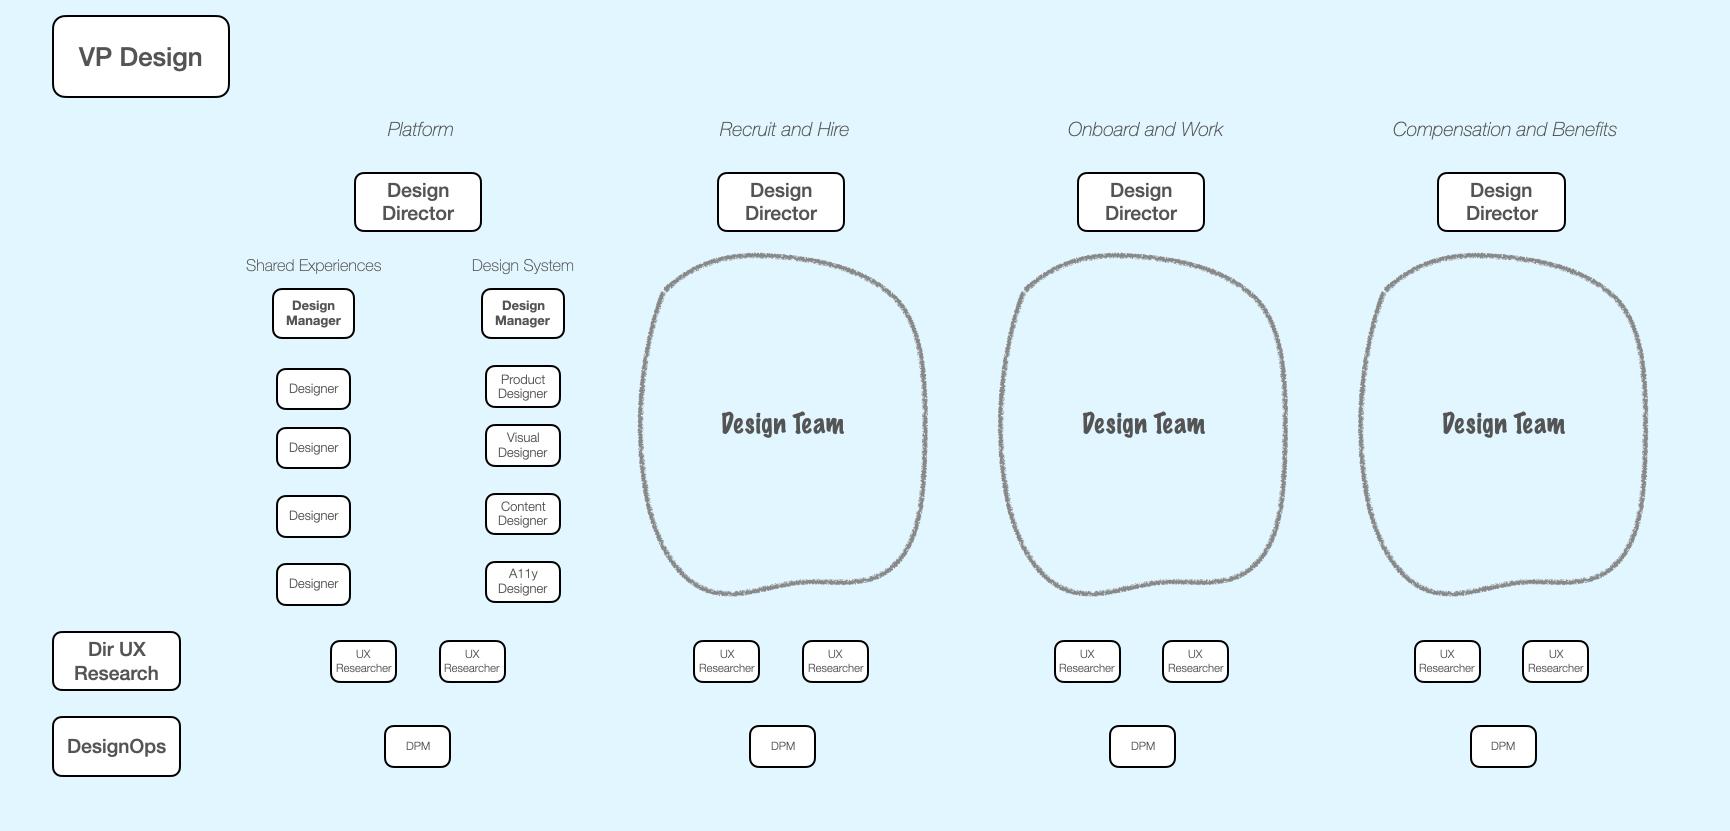 Scaling design organization with platform design remaining the same, on the left